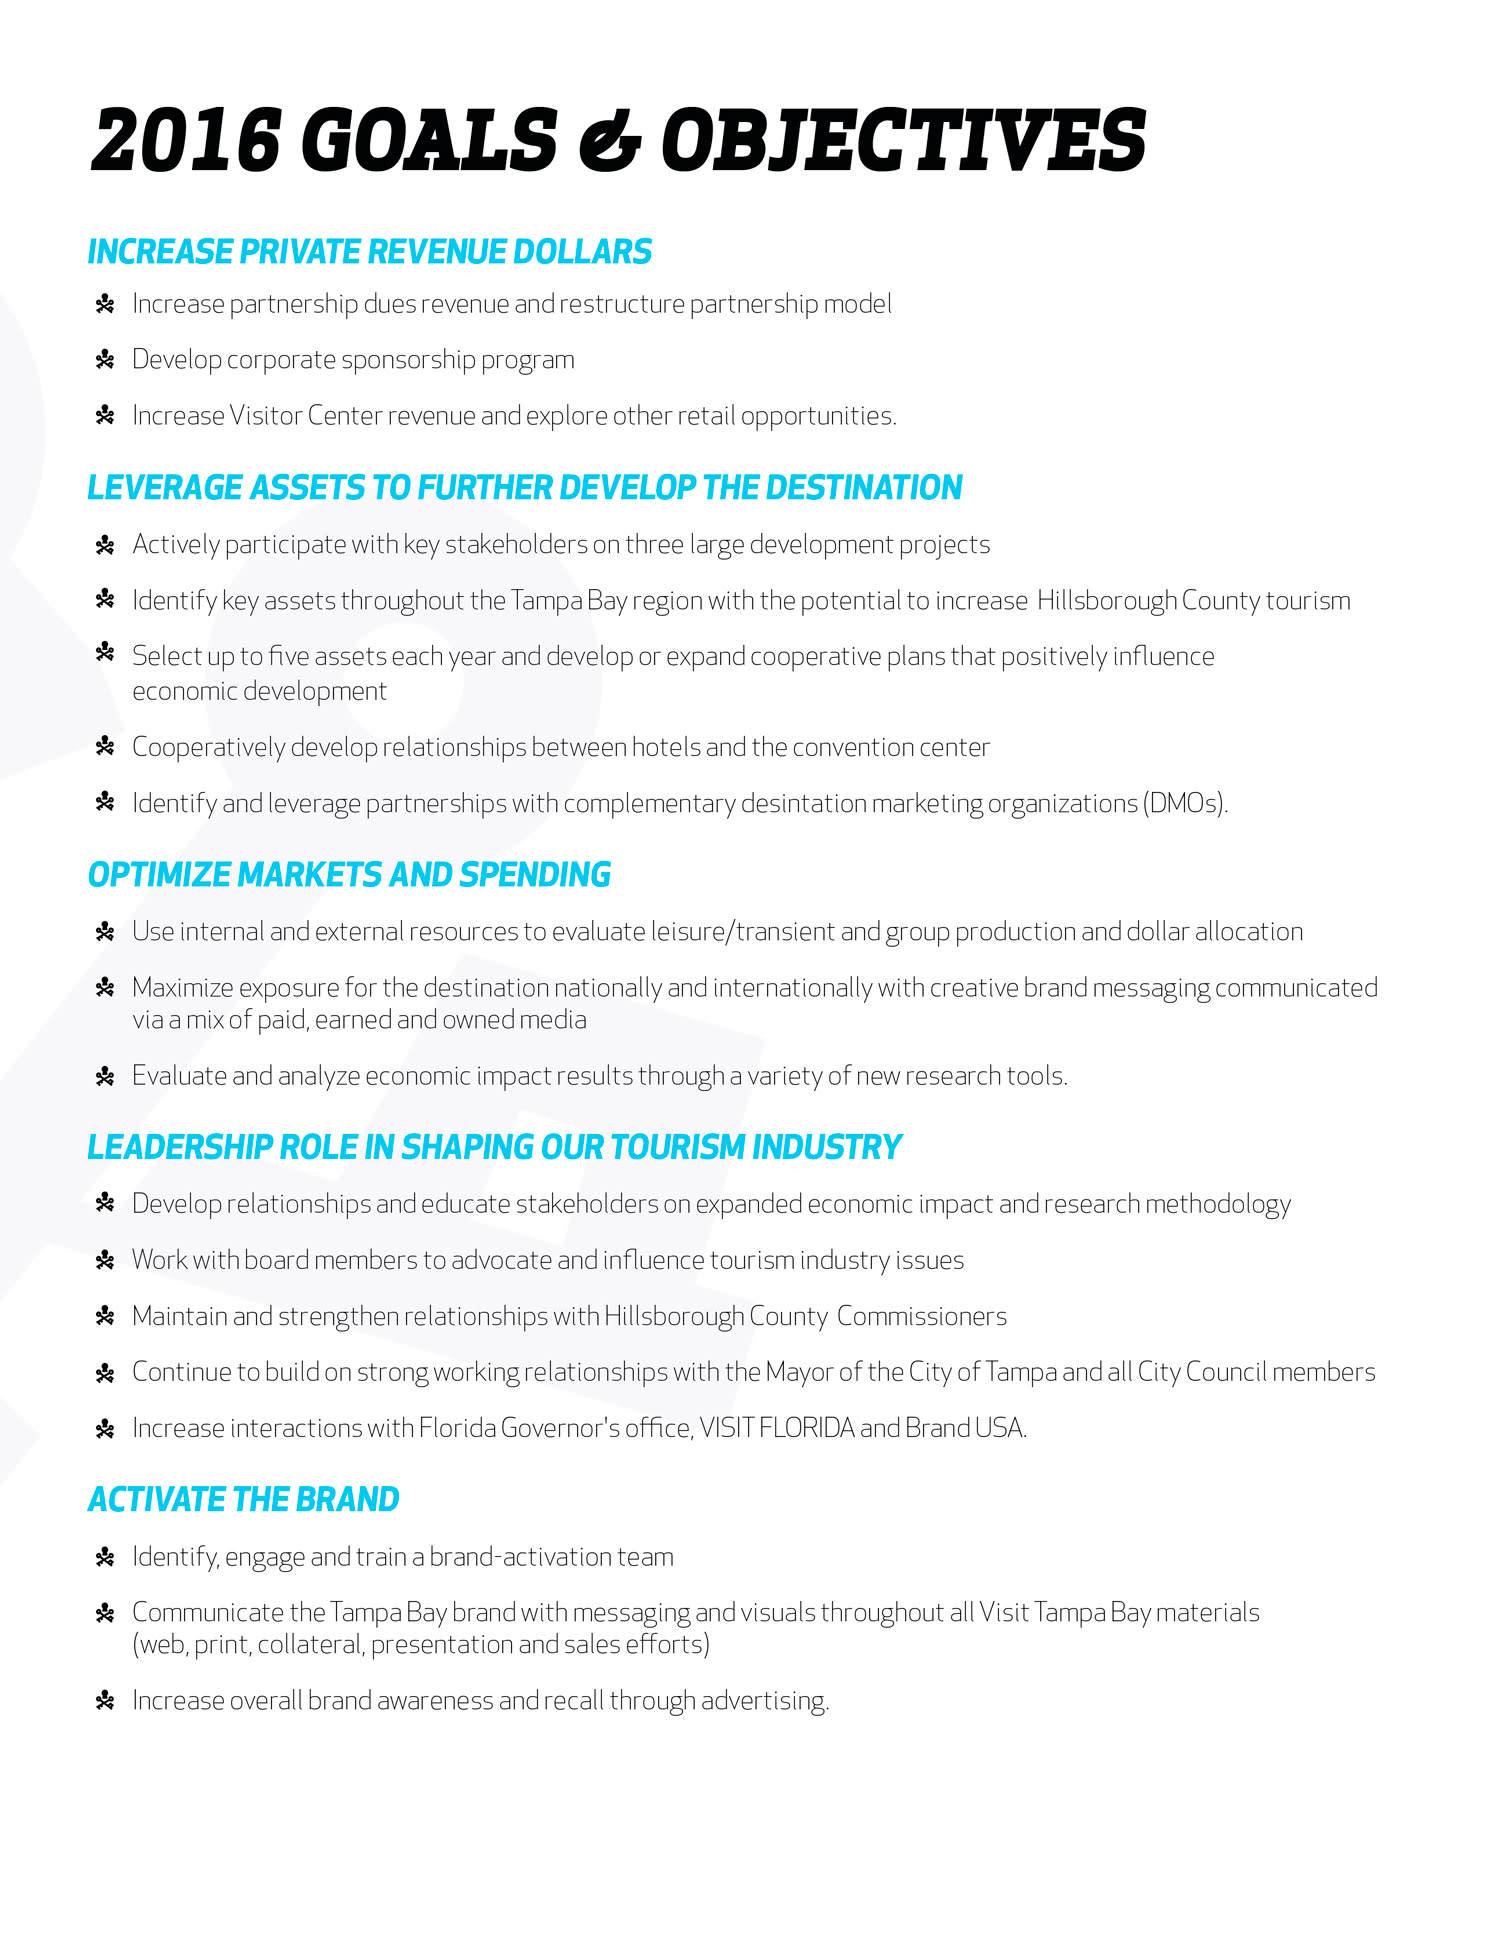 2016 Goals & Objectives